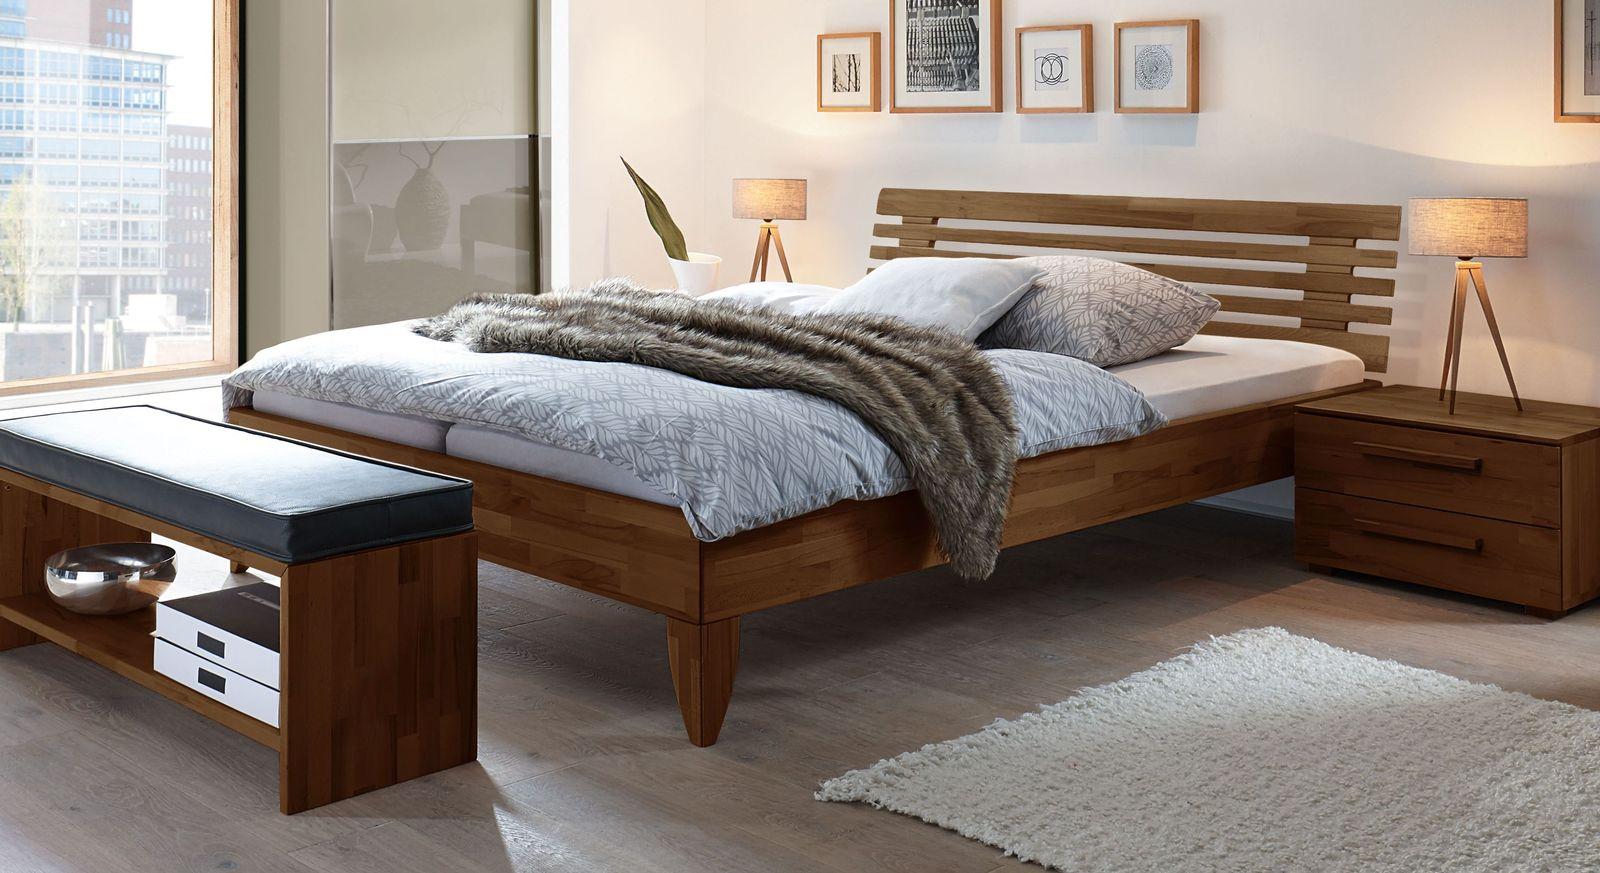 Nussbaumfarbenes Bett Fontana aus Buche